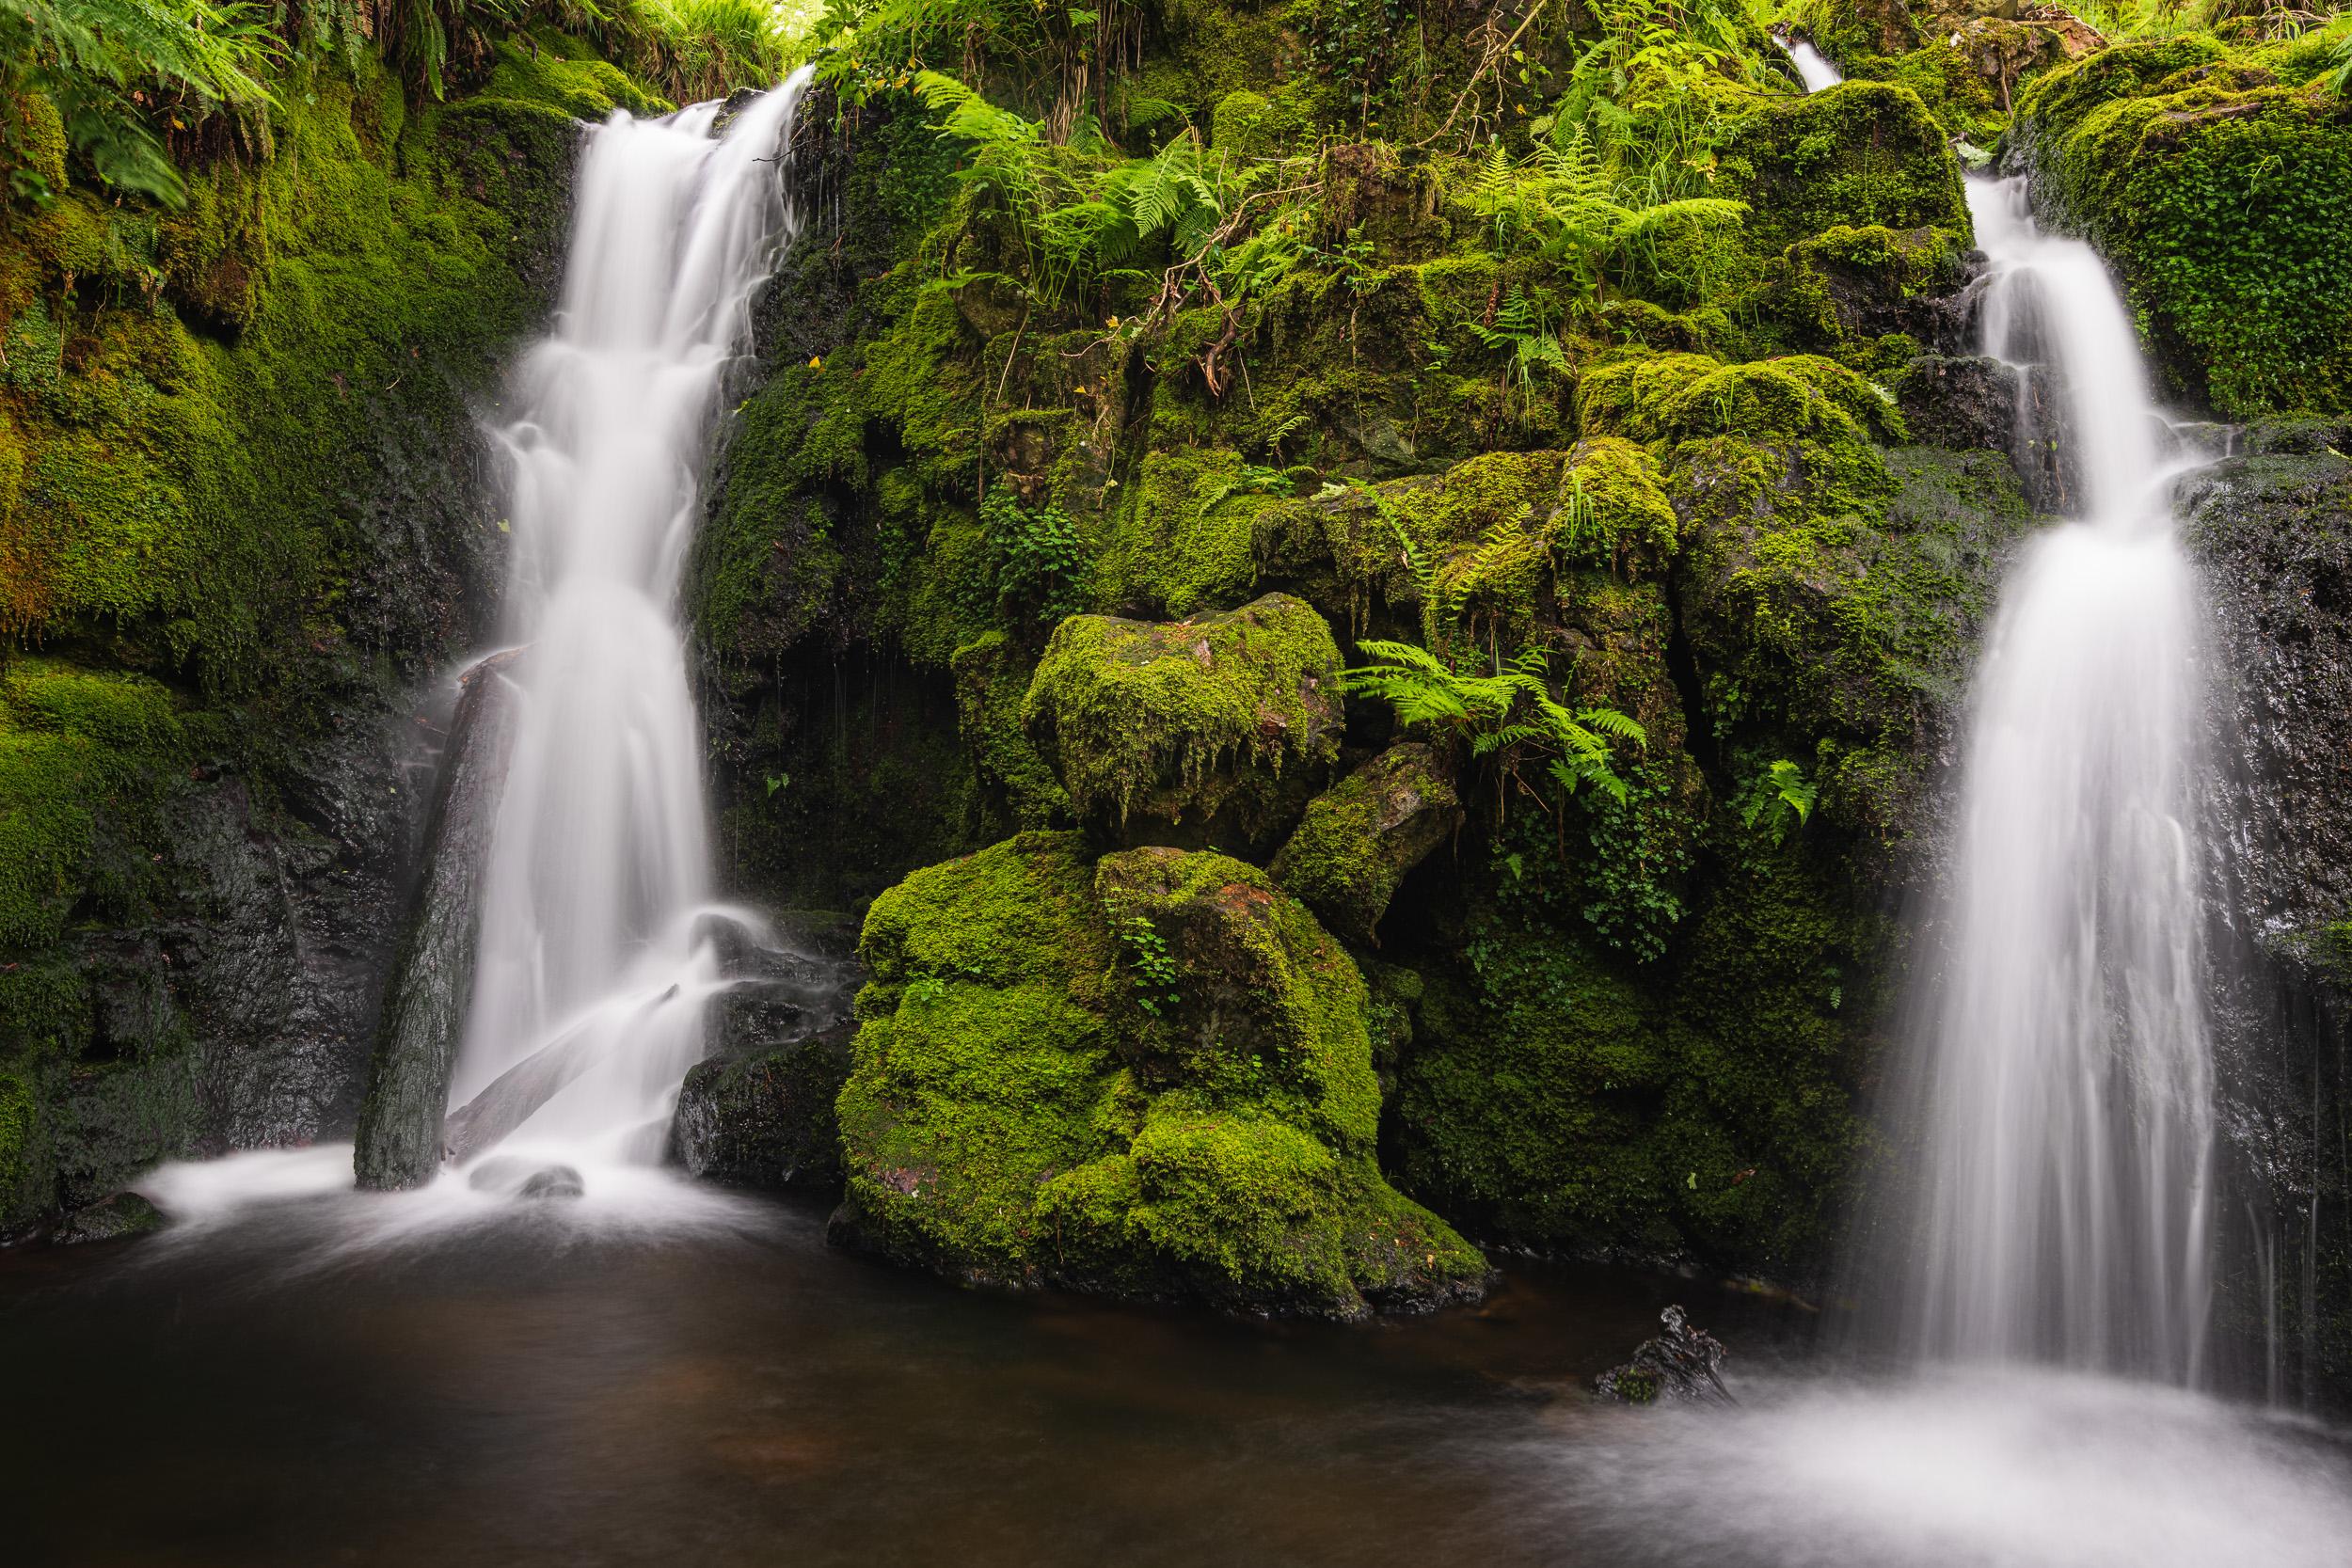 The Twin Falls of Venford, Dartmoor, Devon  - Nikon D850, Nikkor 16-35 mm f/4 at 28 mm, f/11, 4 sec at ISO 64, Kase CPL.